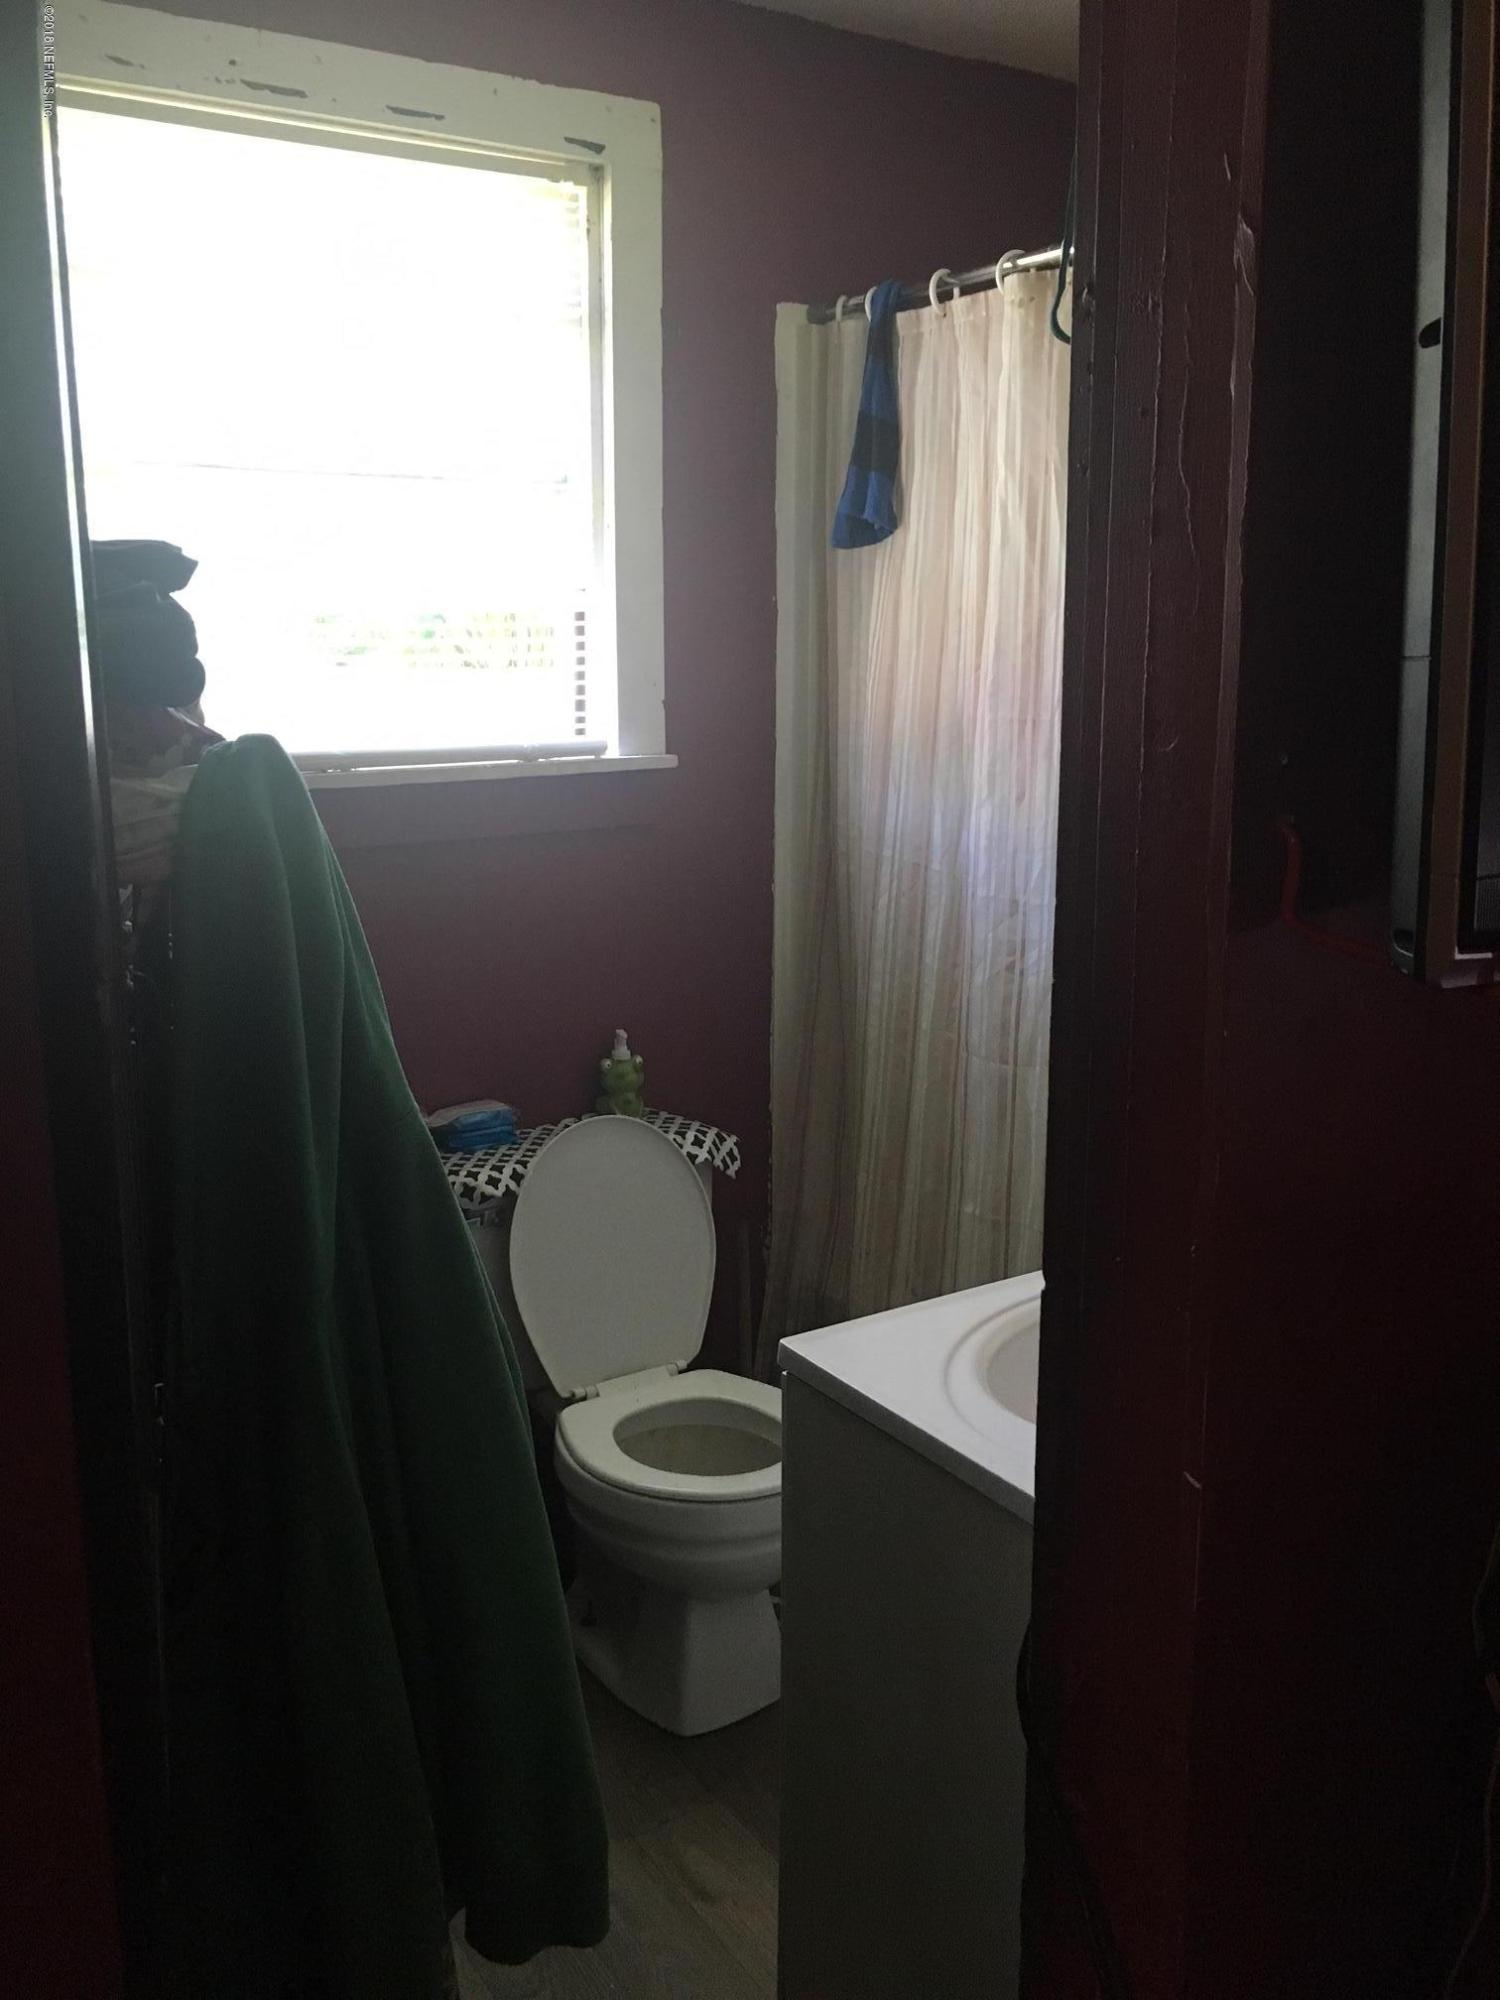 250 NASSAU, ST AUGUSTINE, FLORIDA 32084, 3 Bedrooms Bedrooms, ,2 BathroomsBathrooms,Residential - single family,For sale,NASSAU,941329